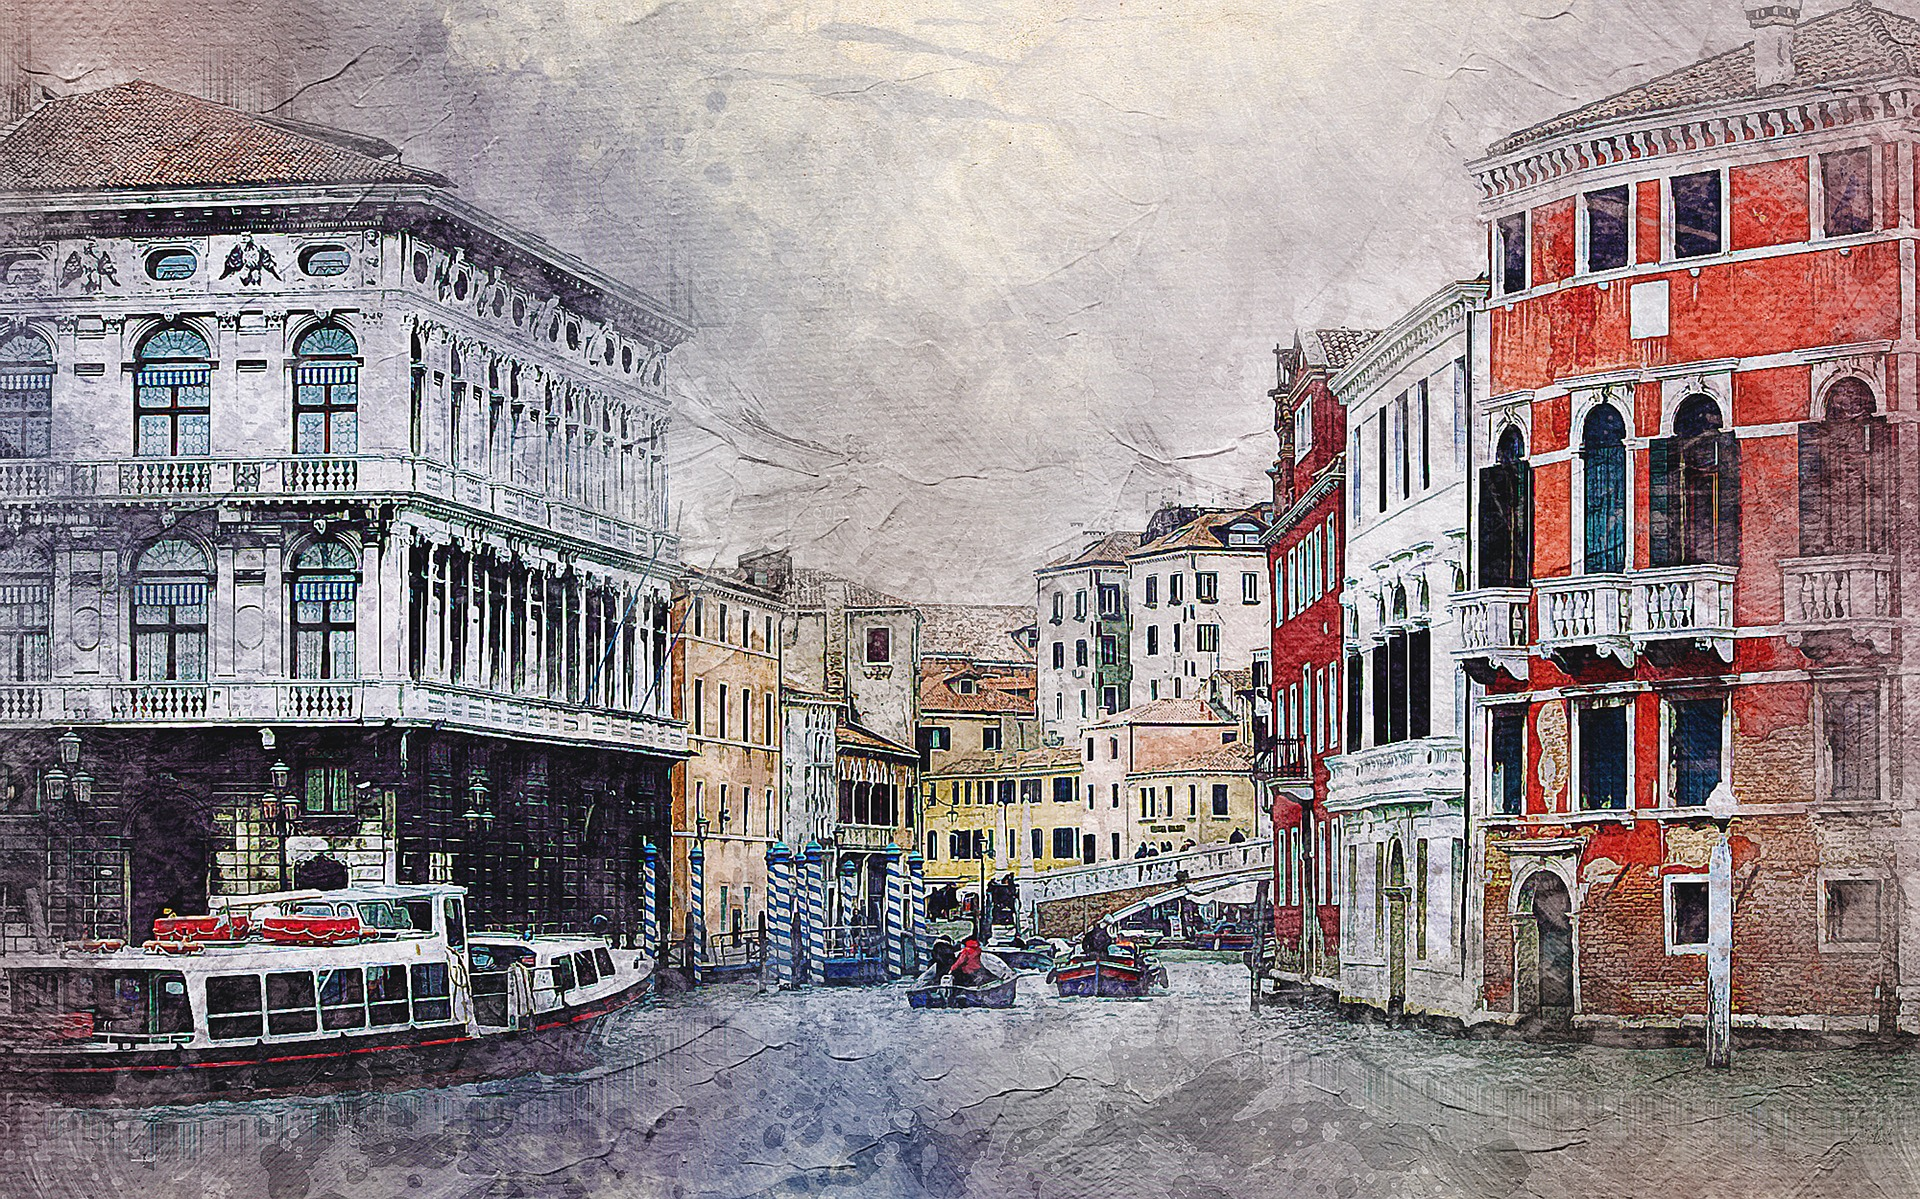 Où investir : petite ou grande ville